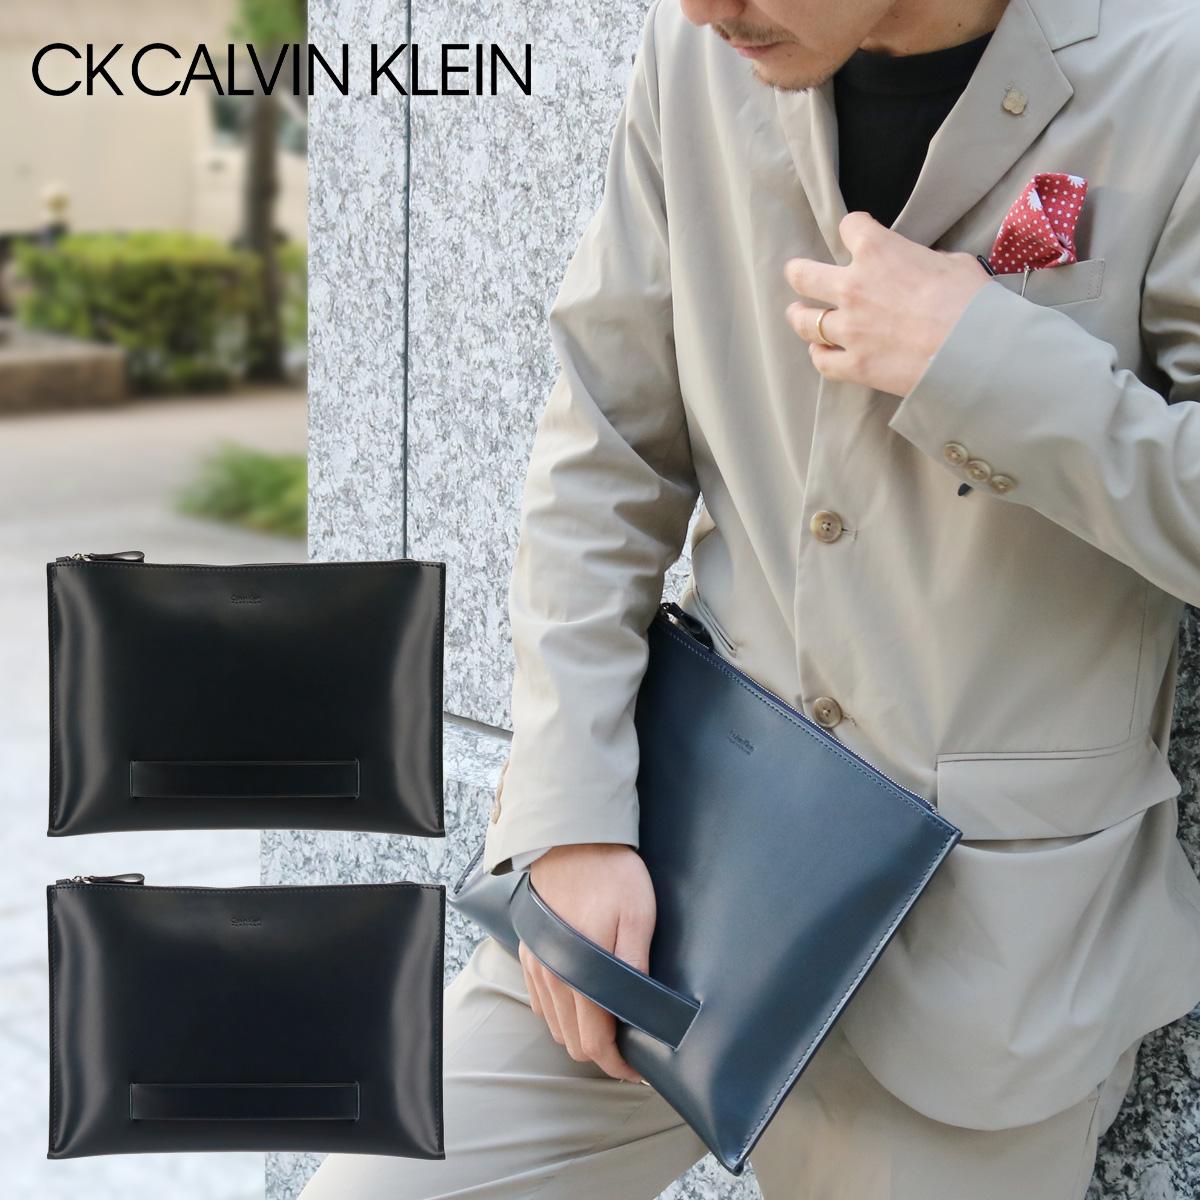 7b8591e32730 シーケーカルバンクライン セカンドバッグ A4 メンズ ダイス 807212 CK CALVIN KLEIN クラッチ ビジネス 本革